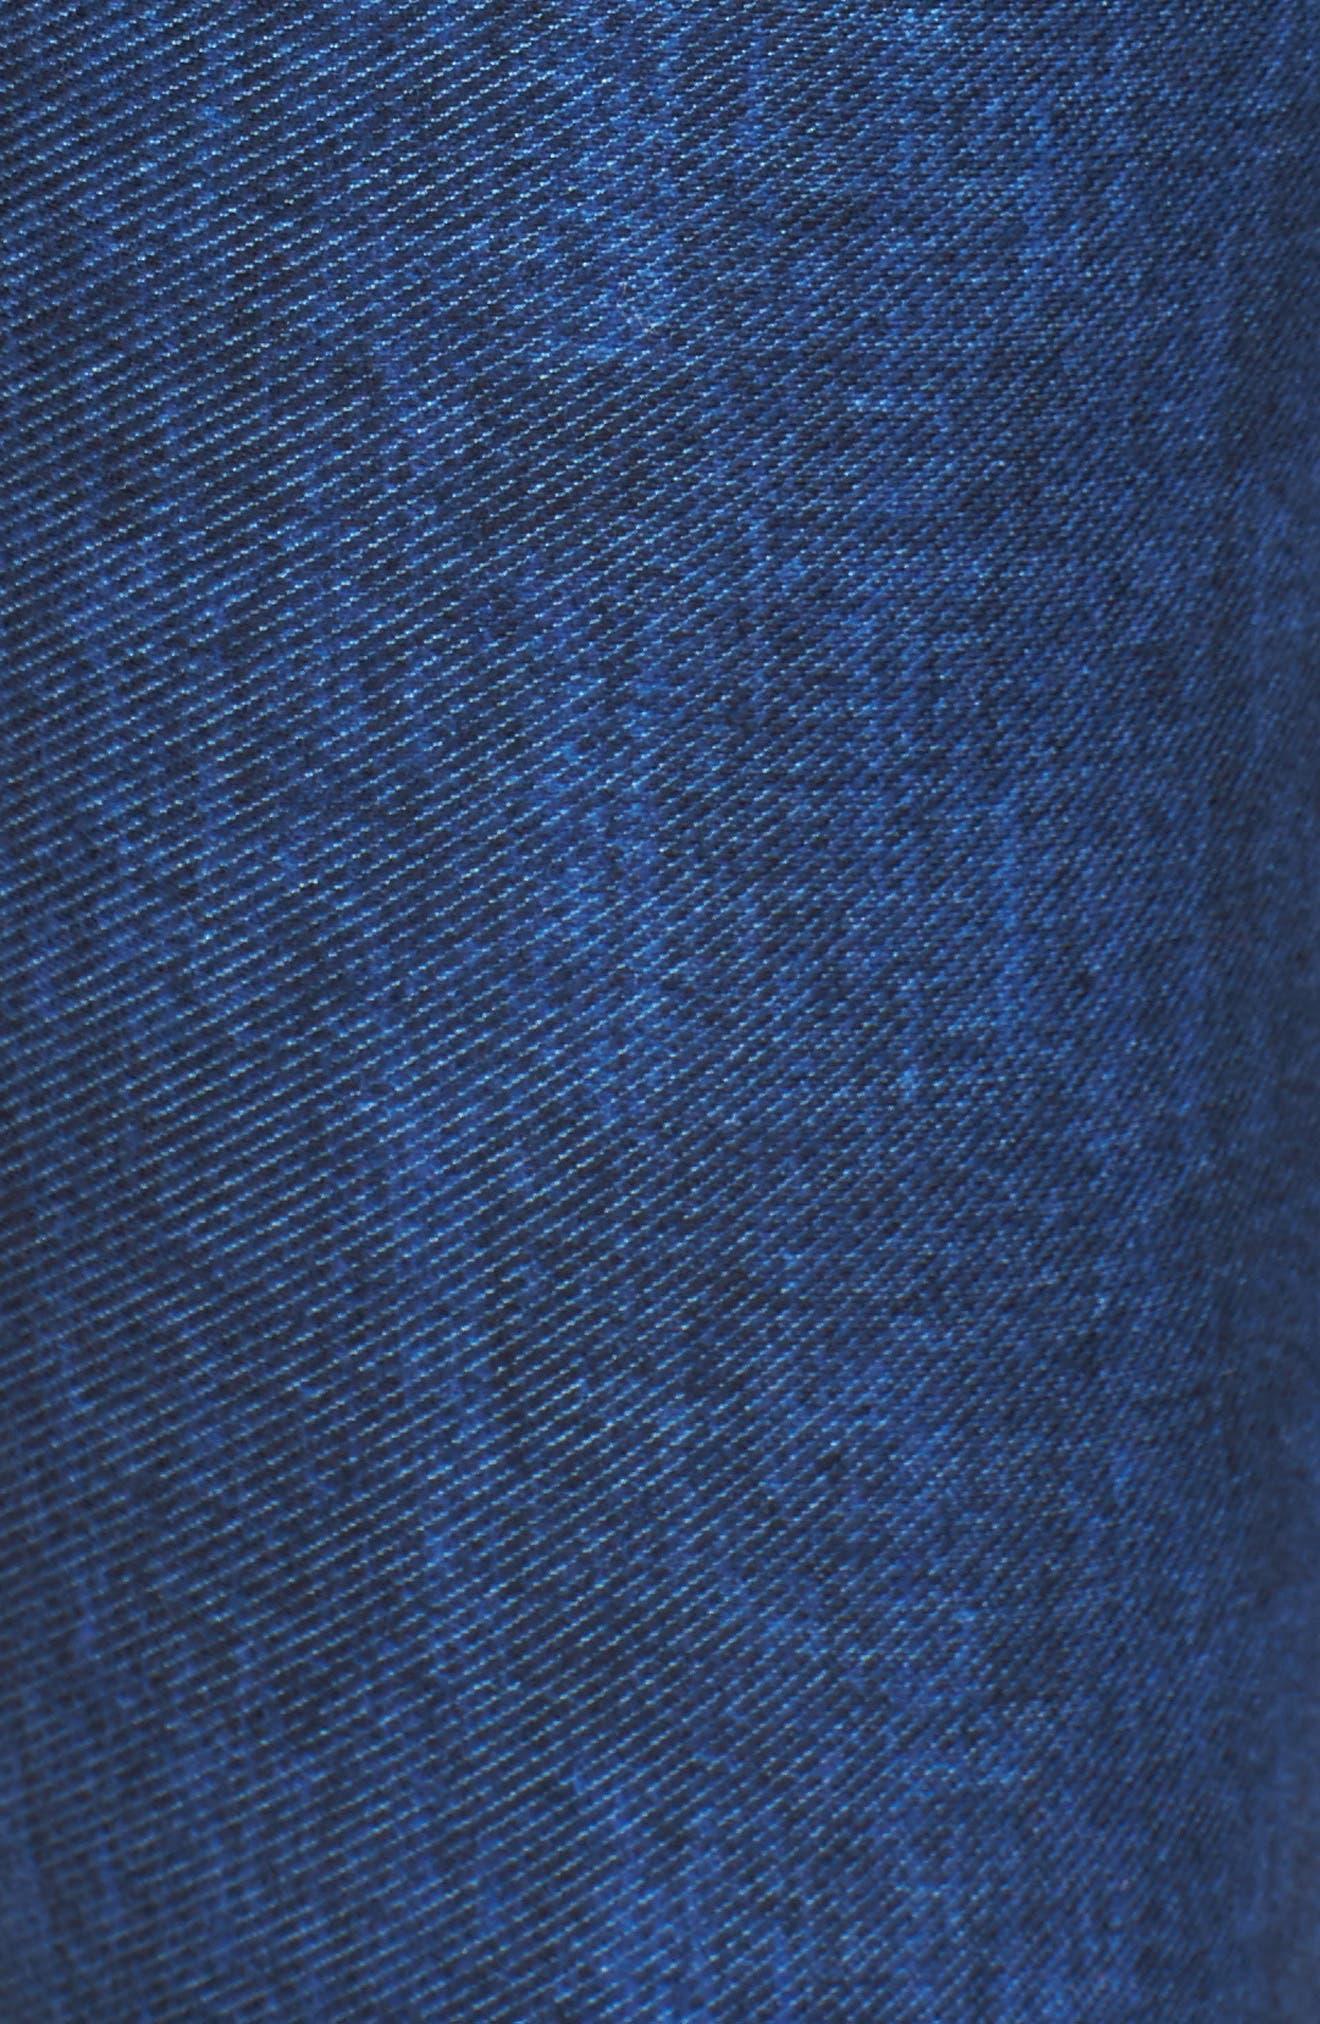 Michael Kors Denim Leggings,                             Alternate thumbnail 5, color,                             BLUE INDIGO